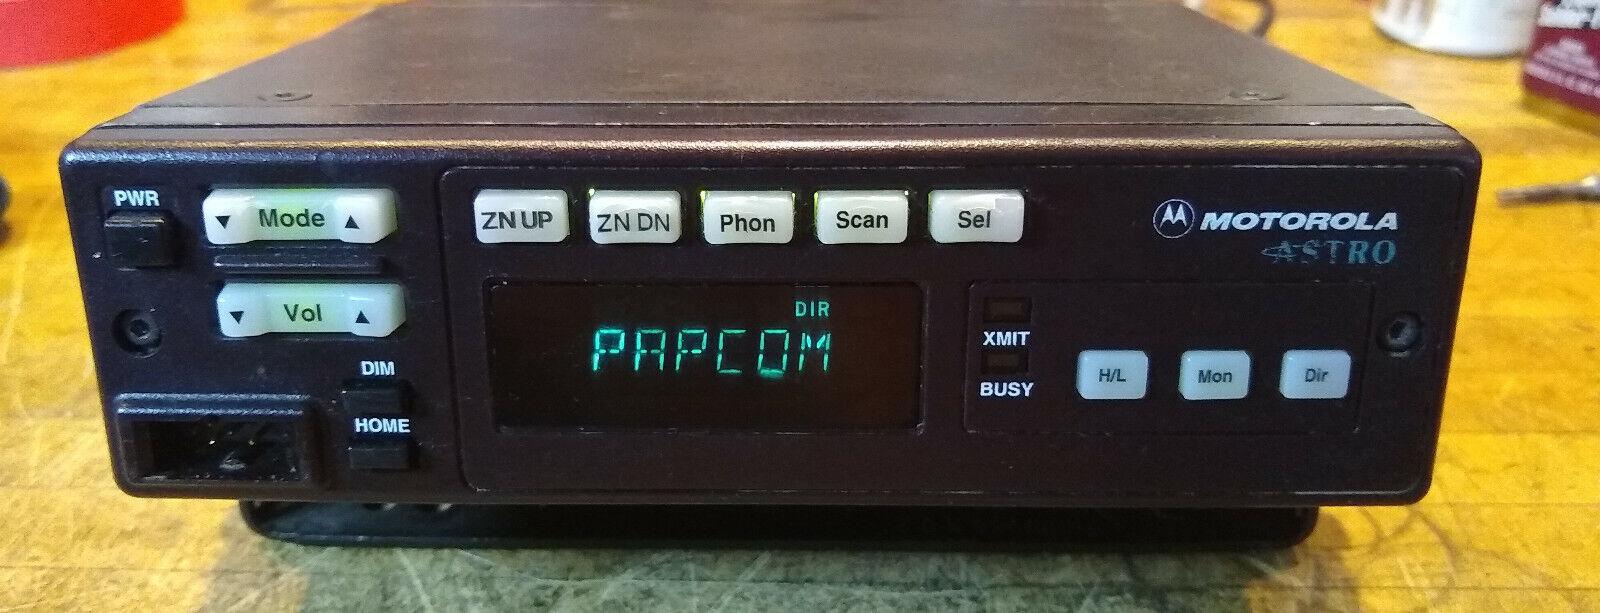 REFURBISHED MOTOROLA ASTRO SPECTRA VHF RADIO 50W W5 D04KKF9PW5AN COMPLETE 1YW. Buy it now for 219.00